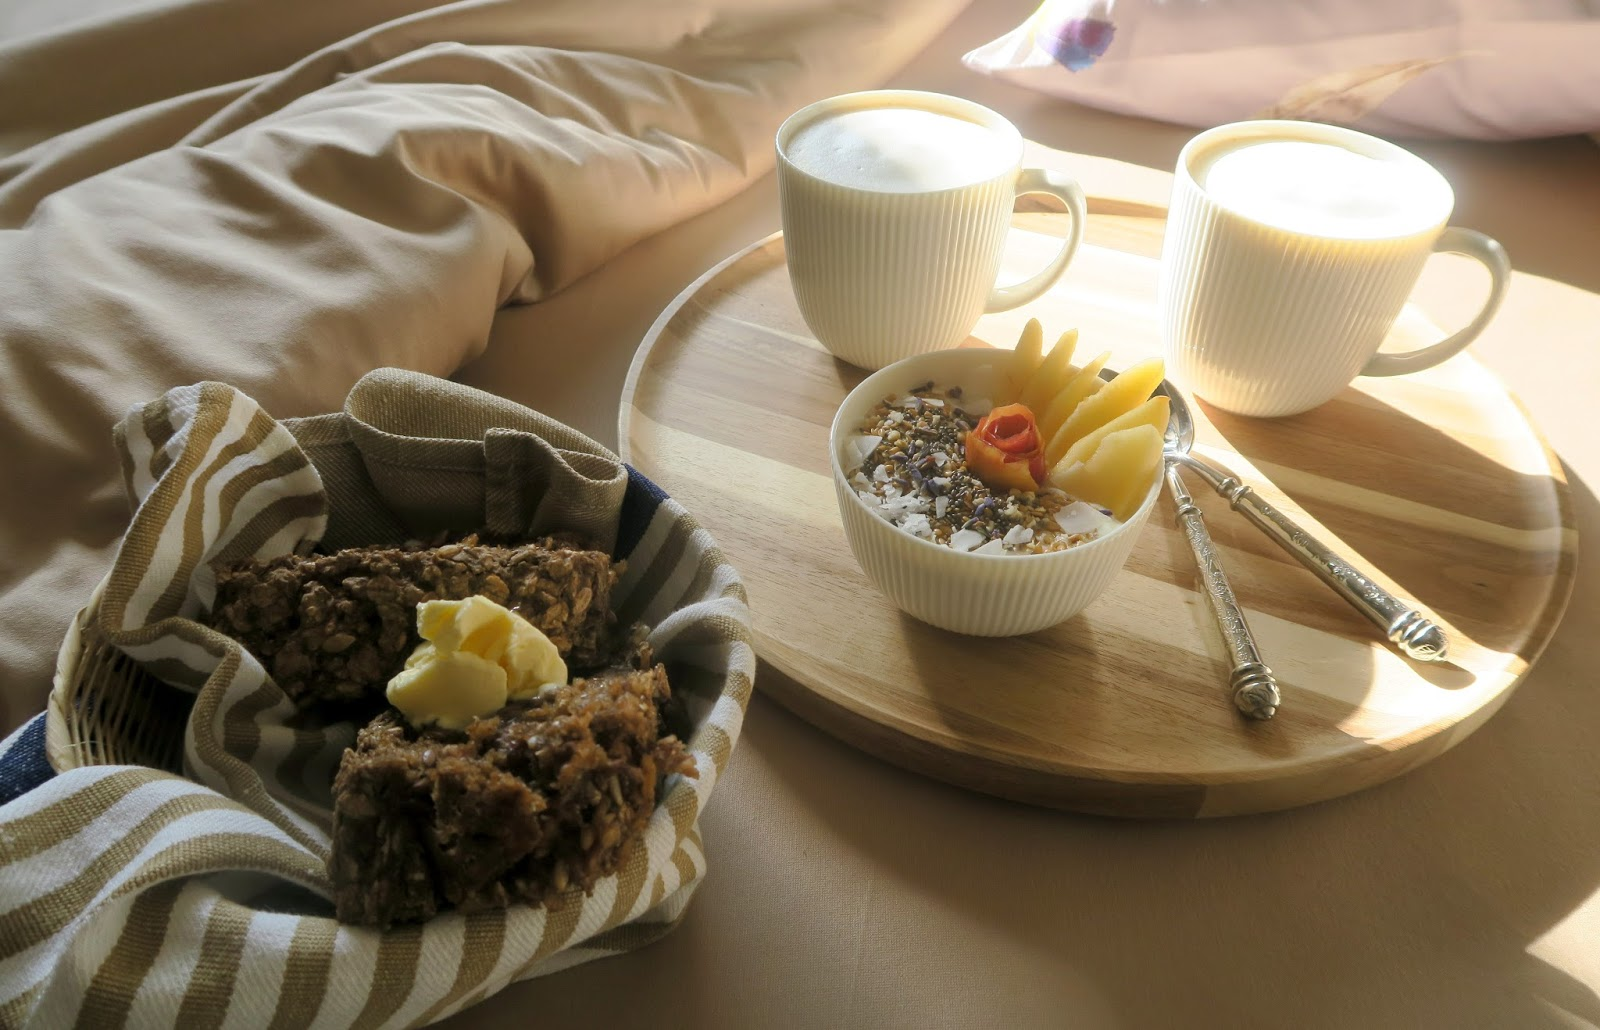 healthy food ideen f r ein gesundes fr hst ck home. Black Bedroom Furniture Sets. Home Design Ideas